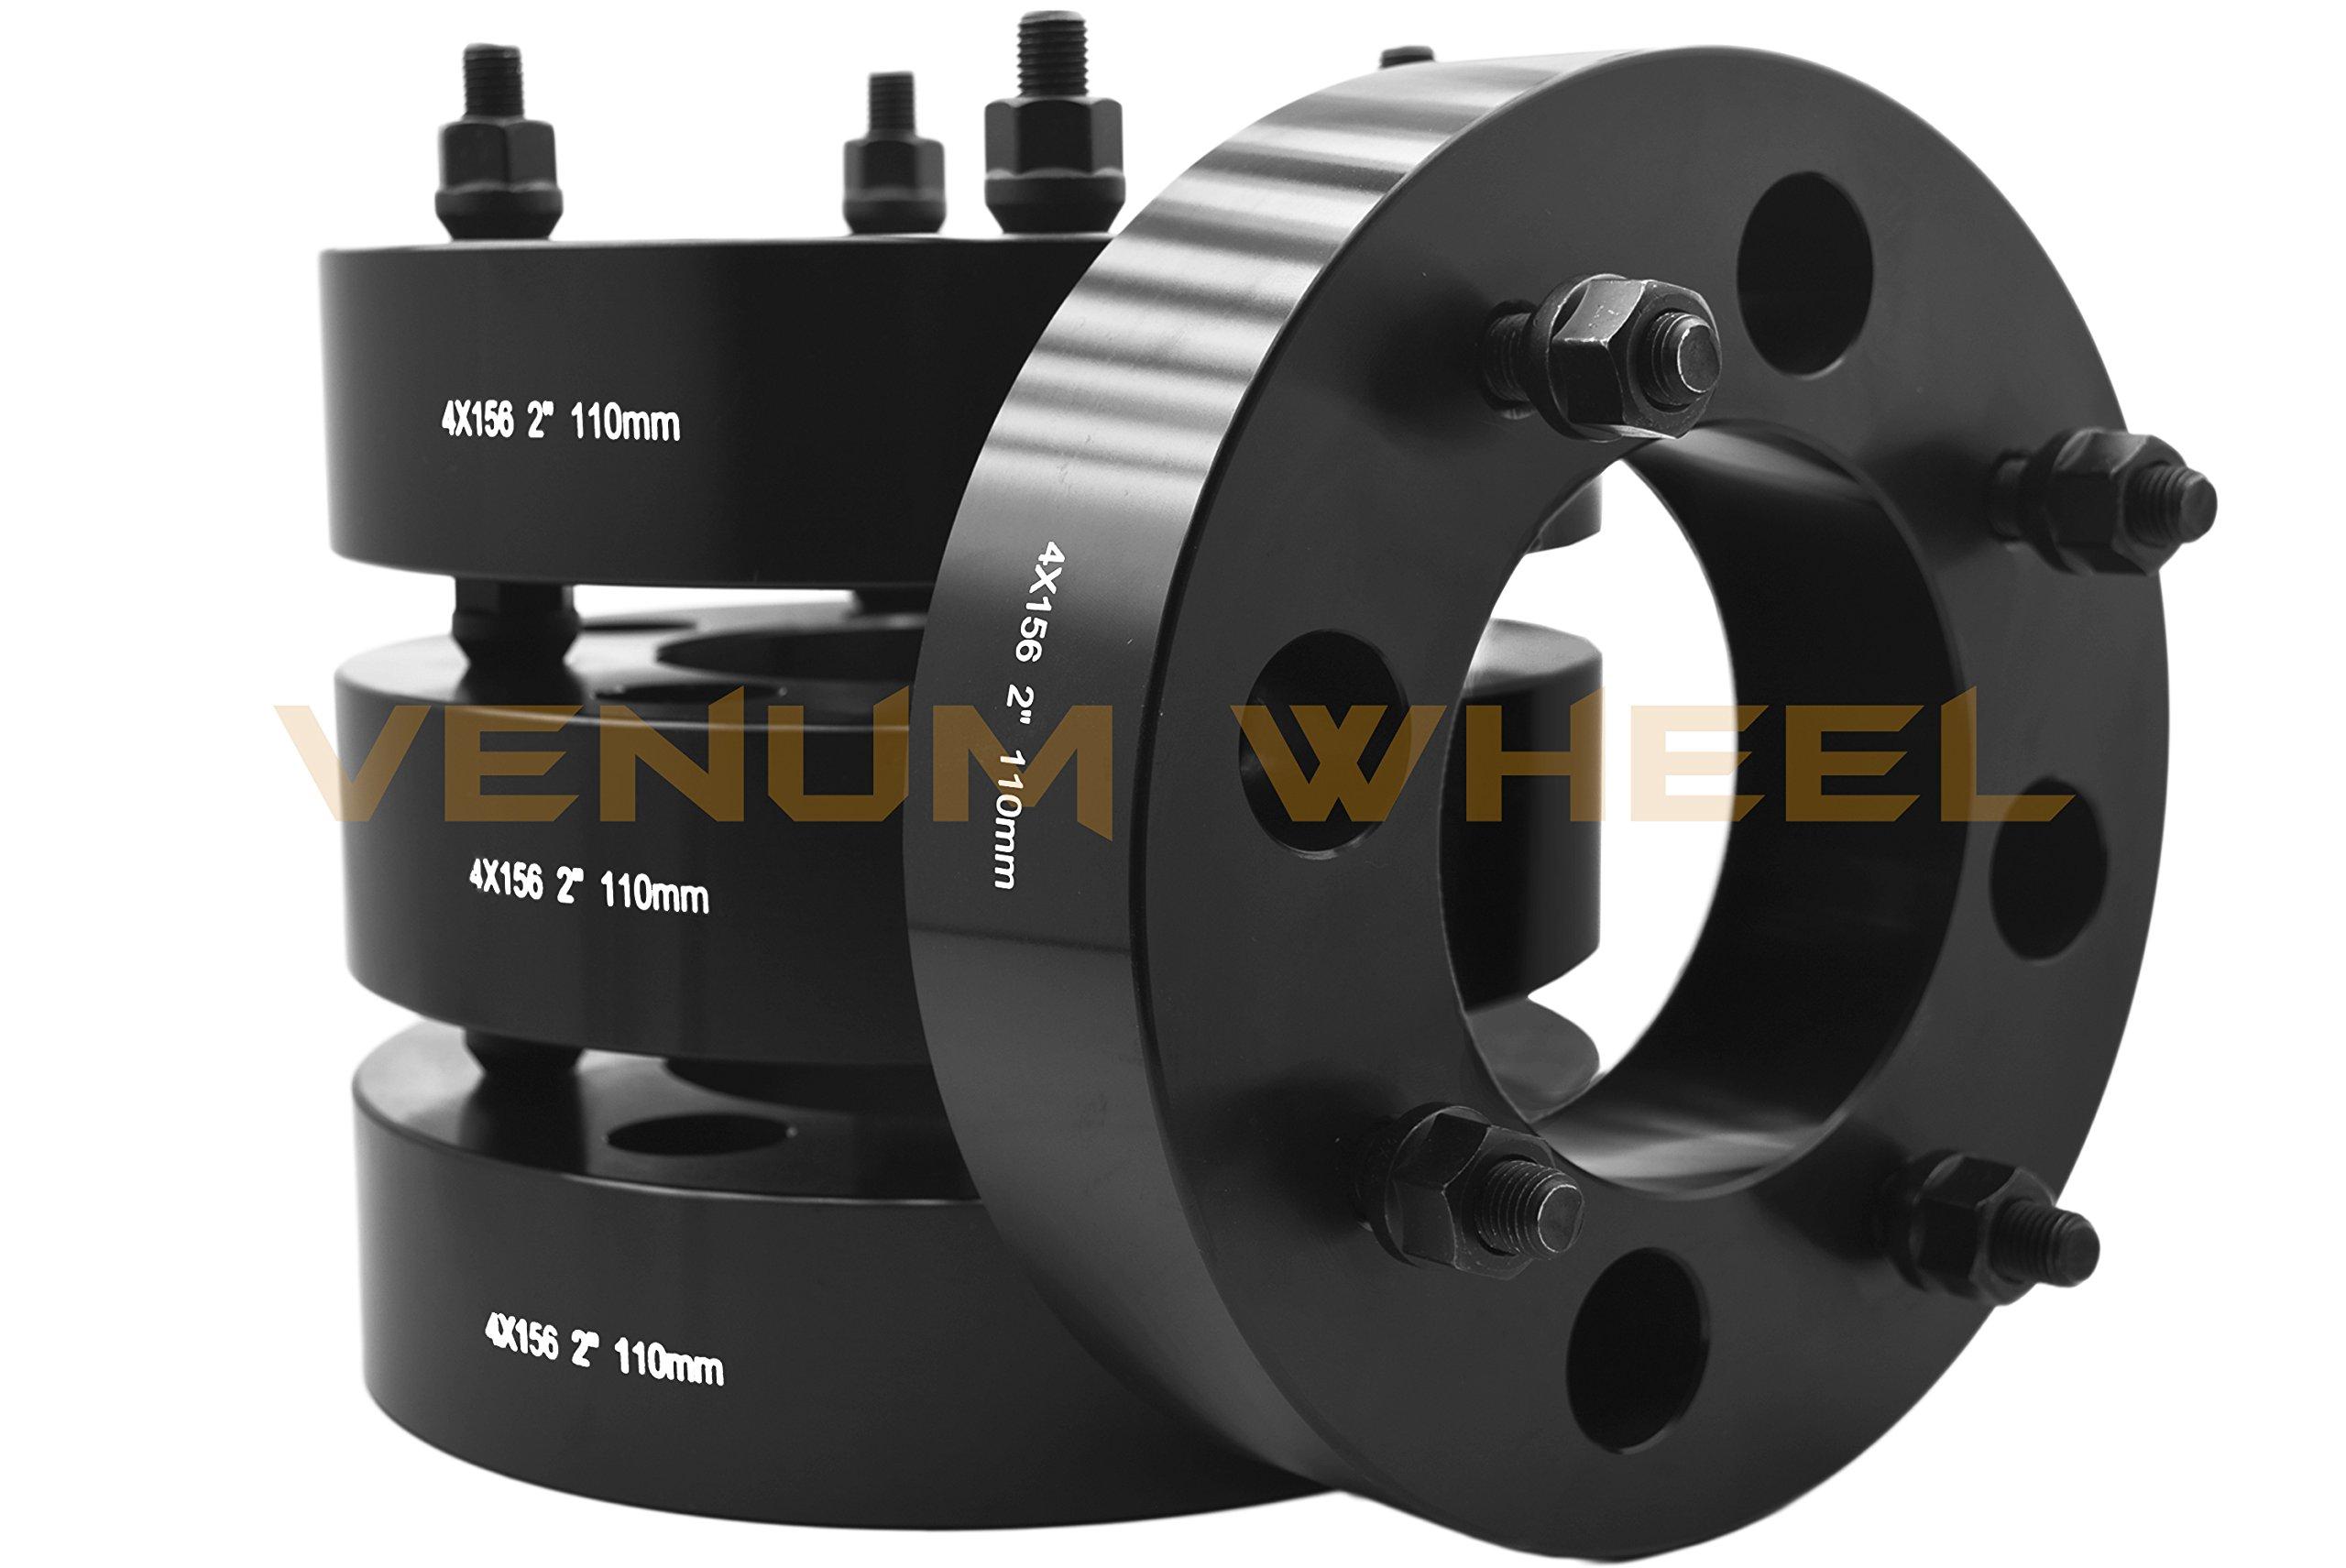 4 Pc 4x156mm Polaris RZR 900 1000 Xp Turbo Black 2'' Thick Wheel Spacers Adapters Bolt On Kit 12x1.5 Lug Nuts